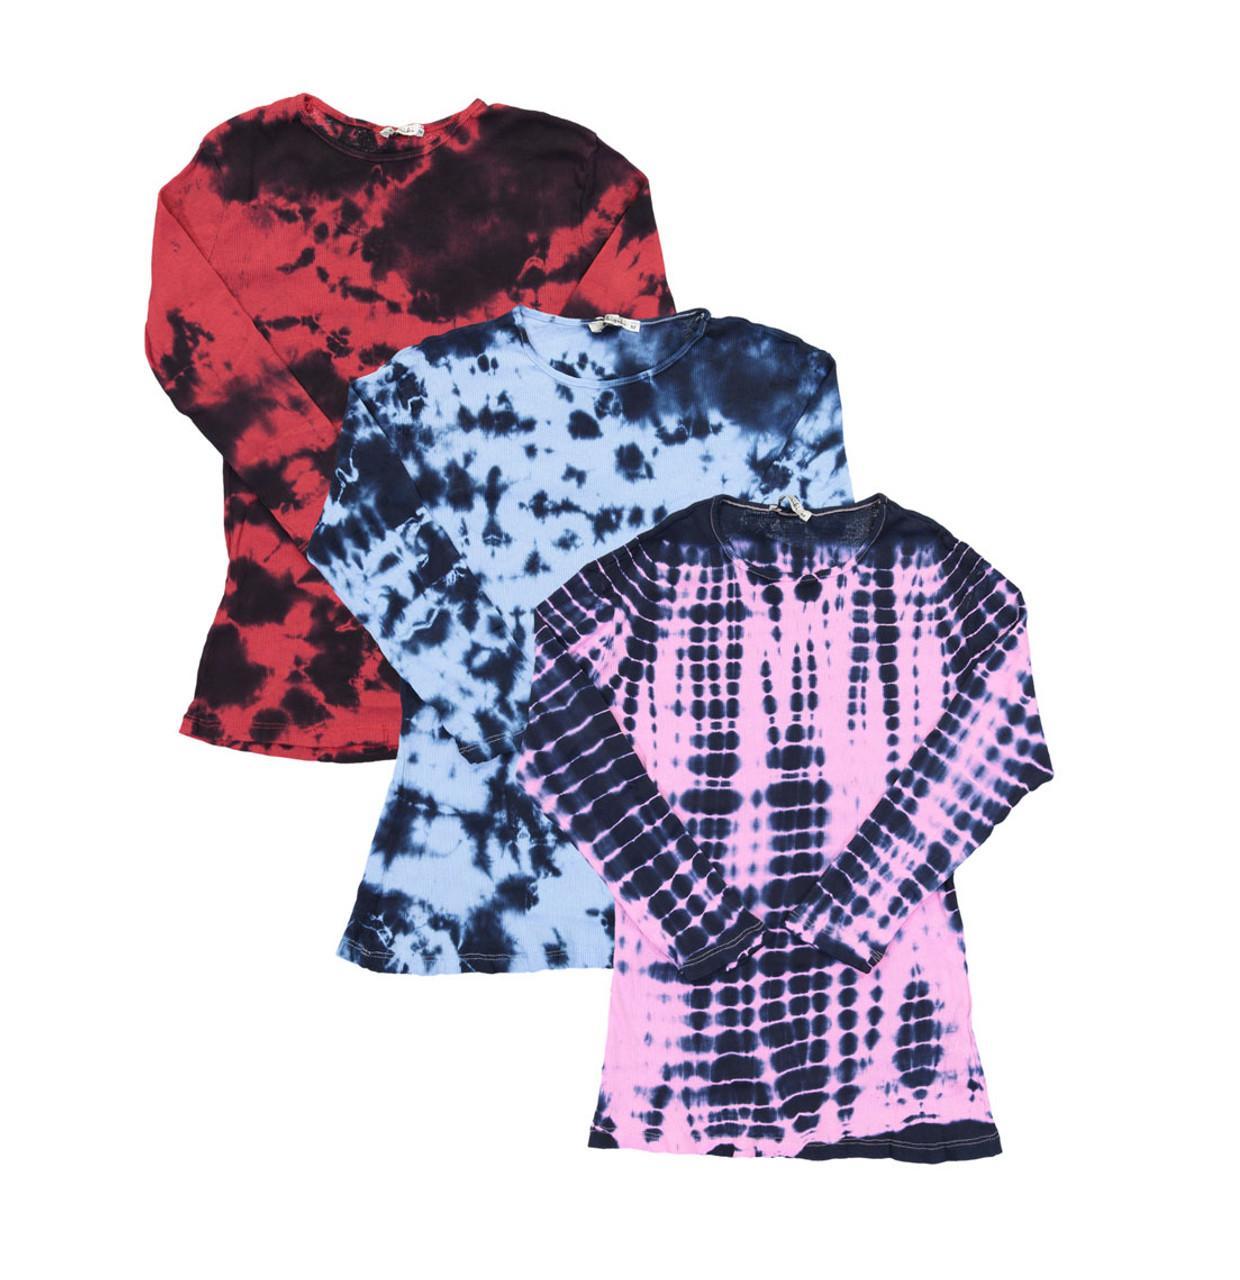 Kiki Riki Womens Dyed T-shirt - 3/4 Sleeve